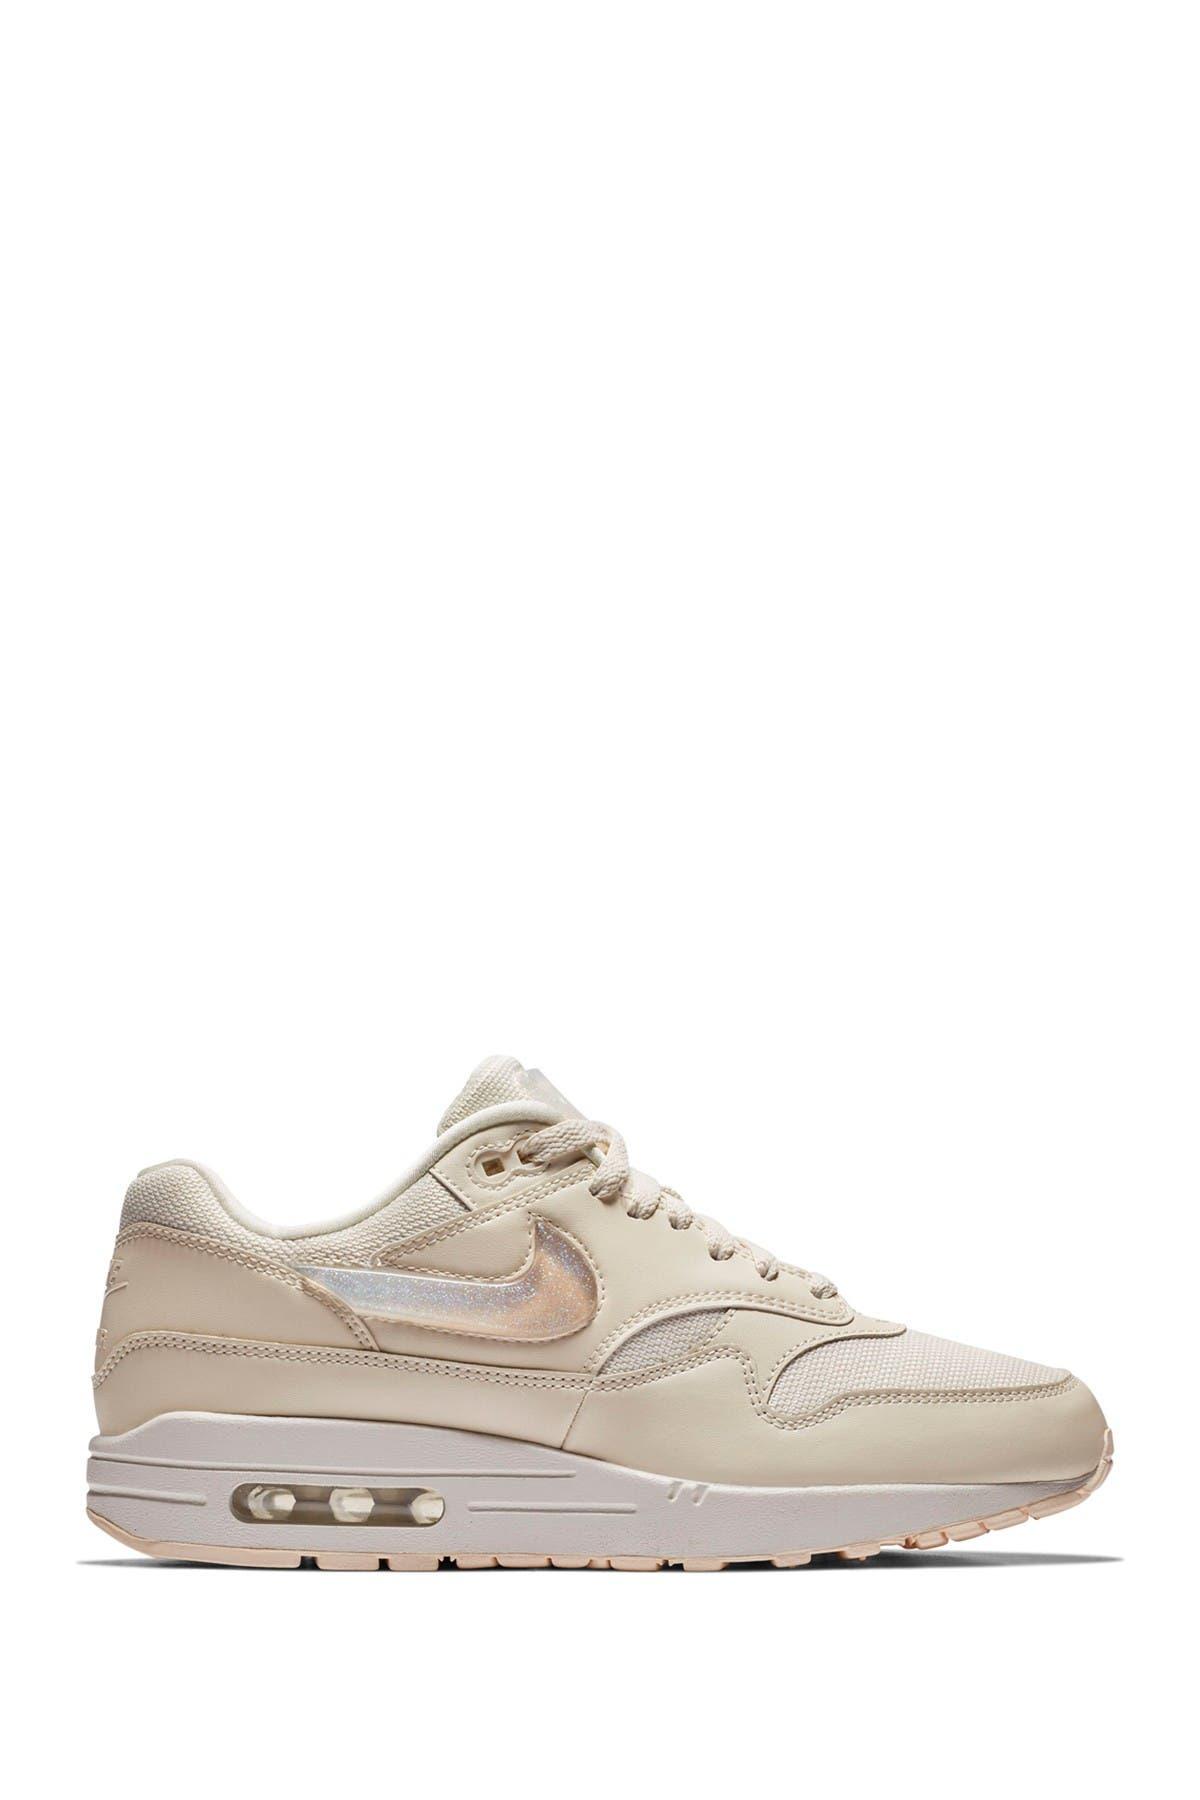 Nike | Air Max 1 Jelly Puff Sneaker